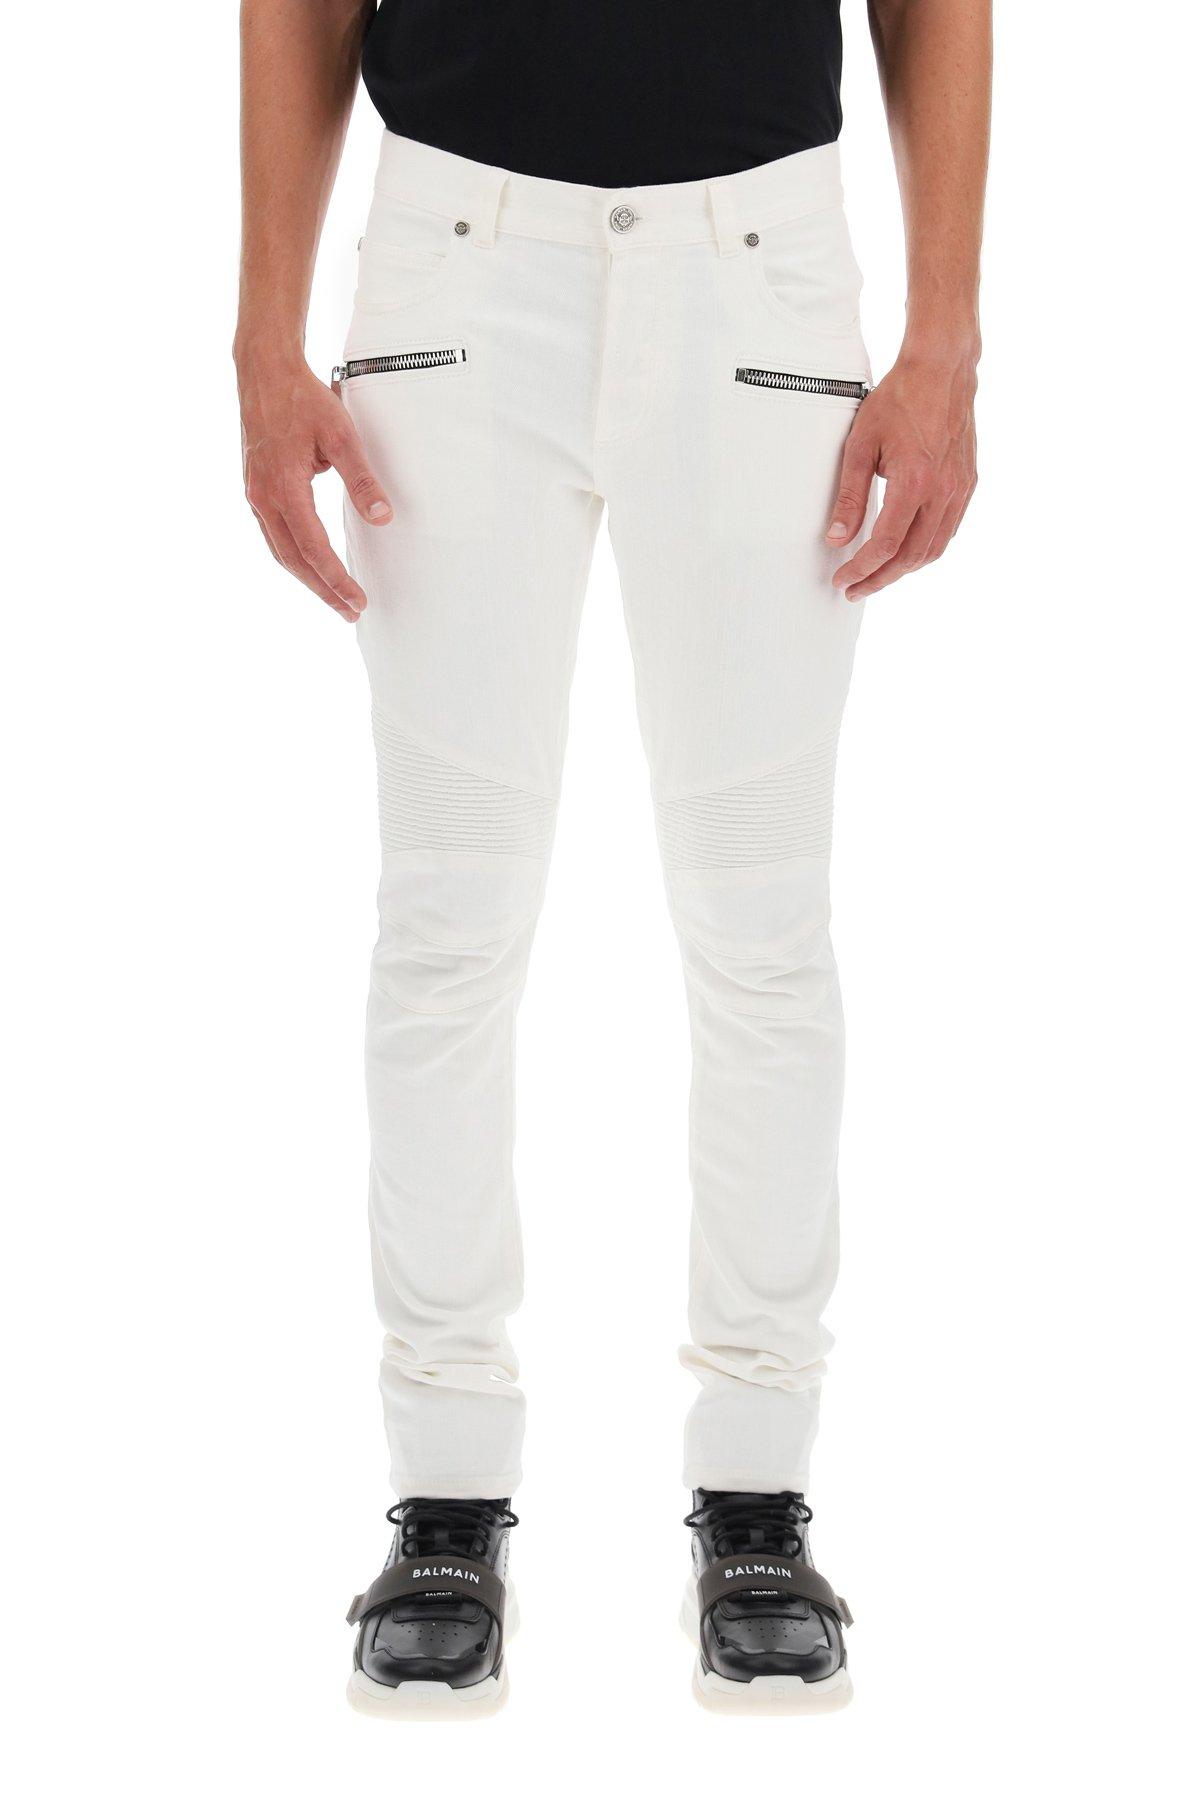 Balmain jeans ribbed slim